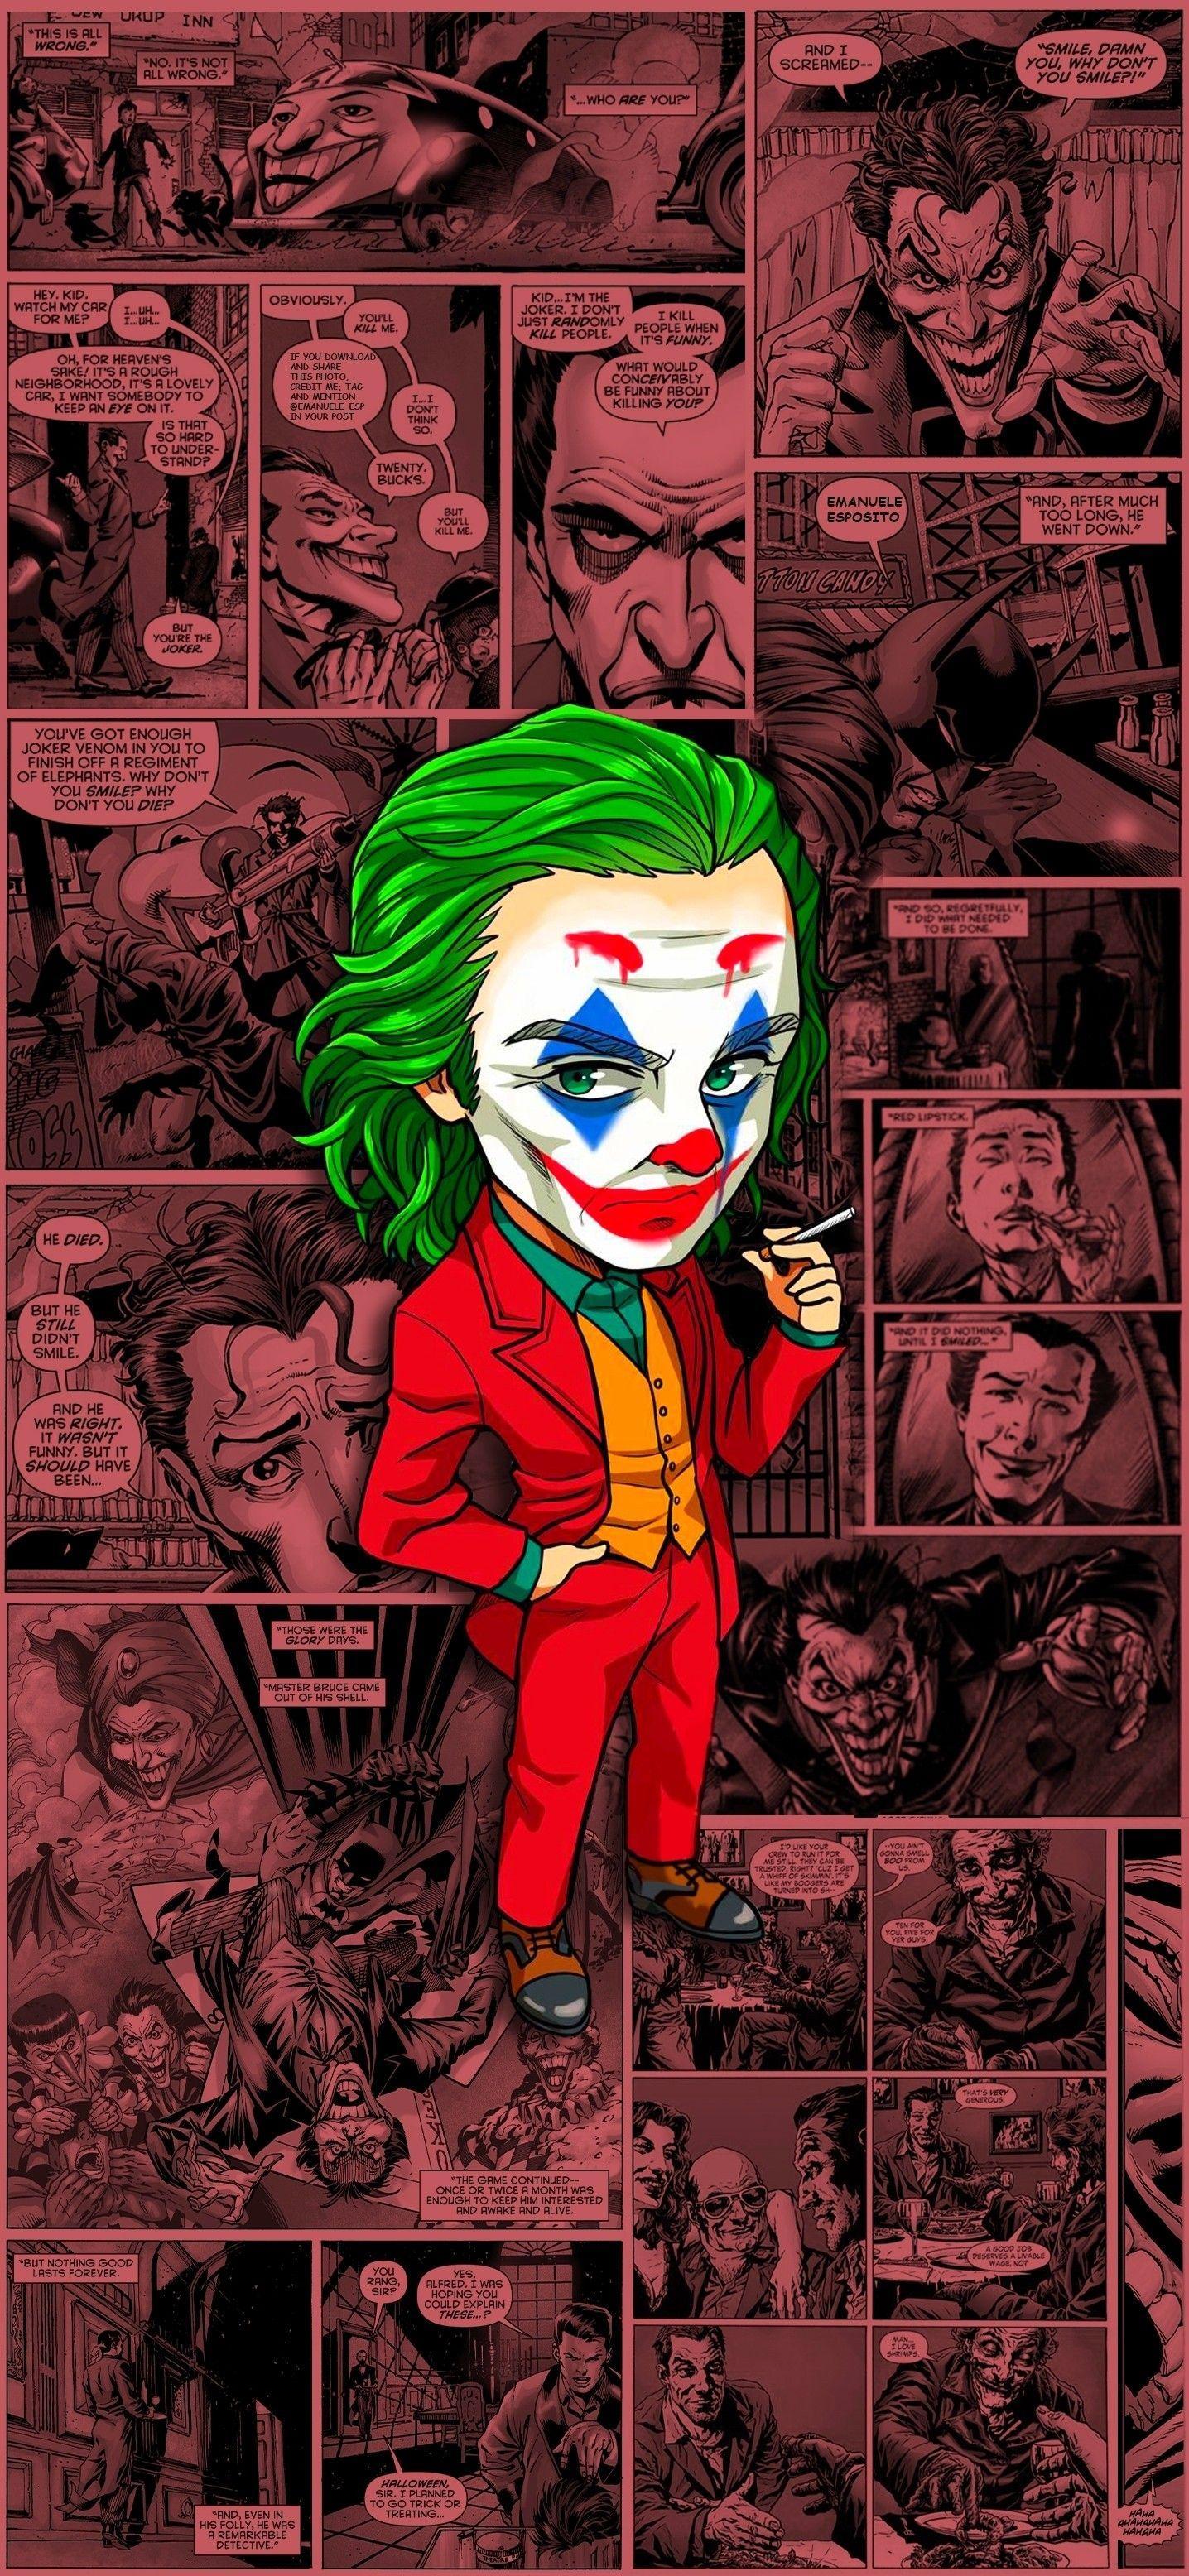 Joker (2019) Phone Wallpaper Joker hd wallpaper, Joker